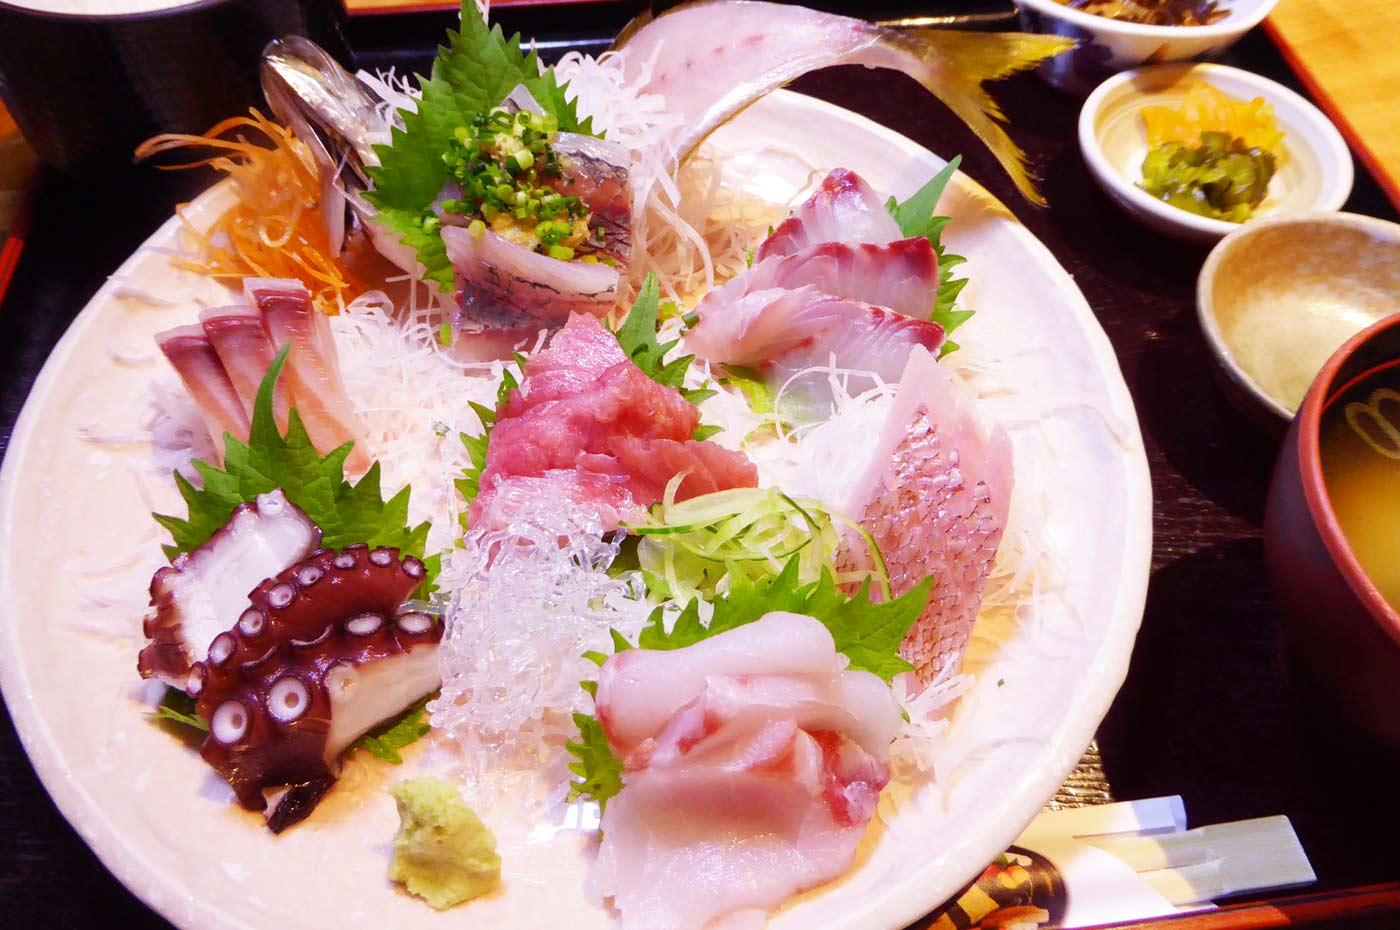 若鈴の地魚定食